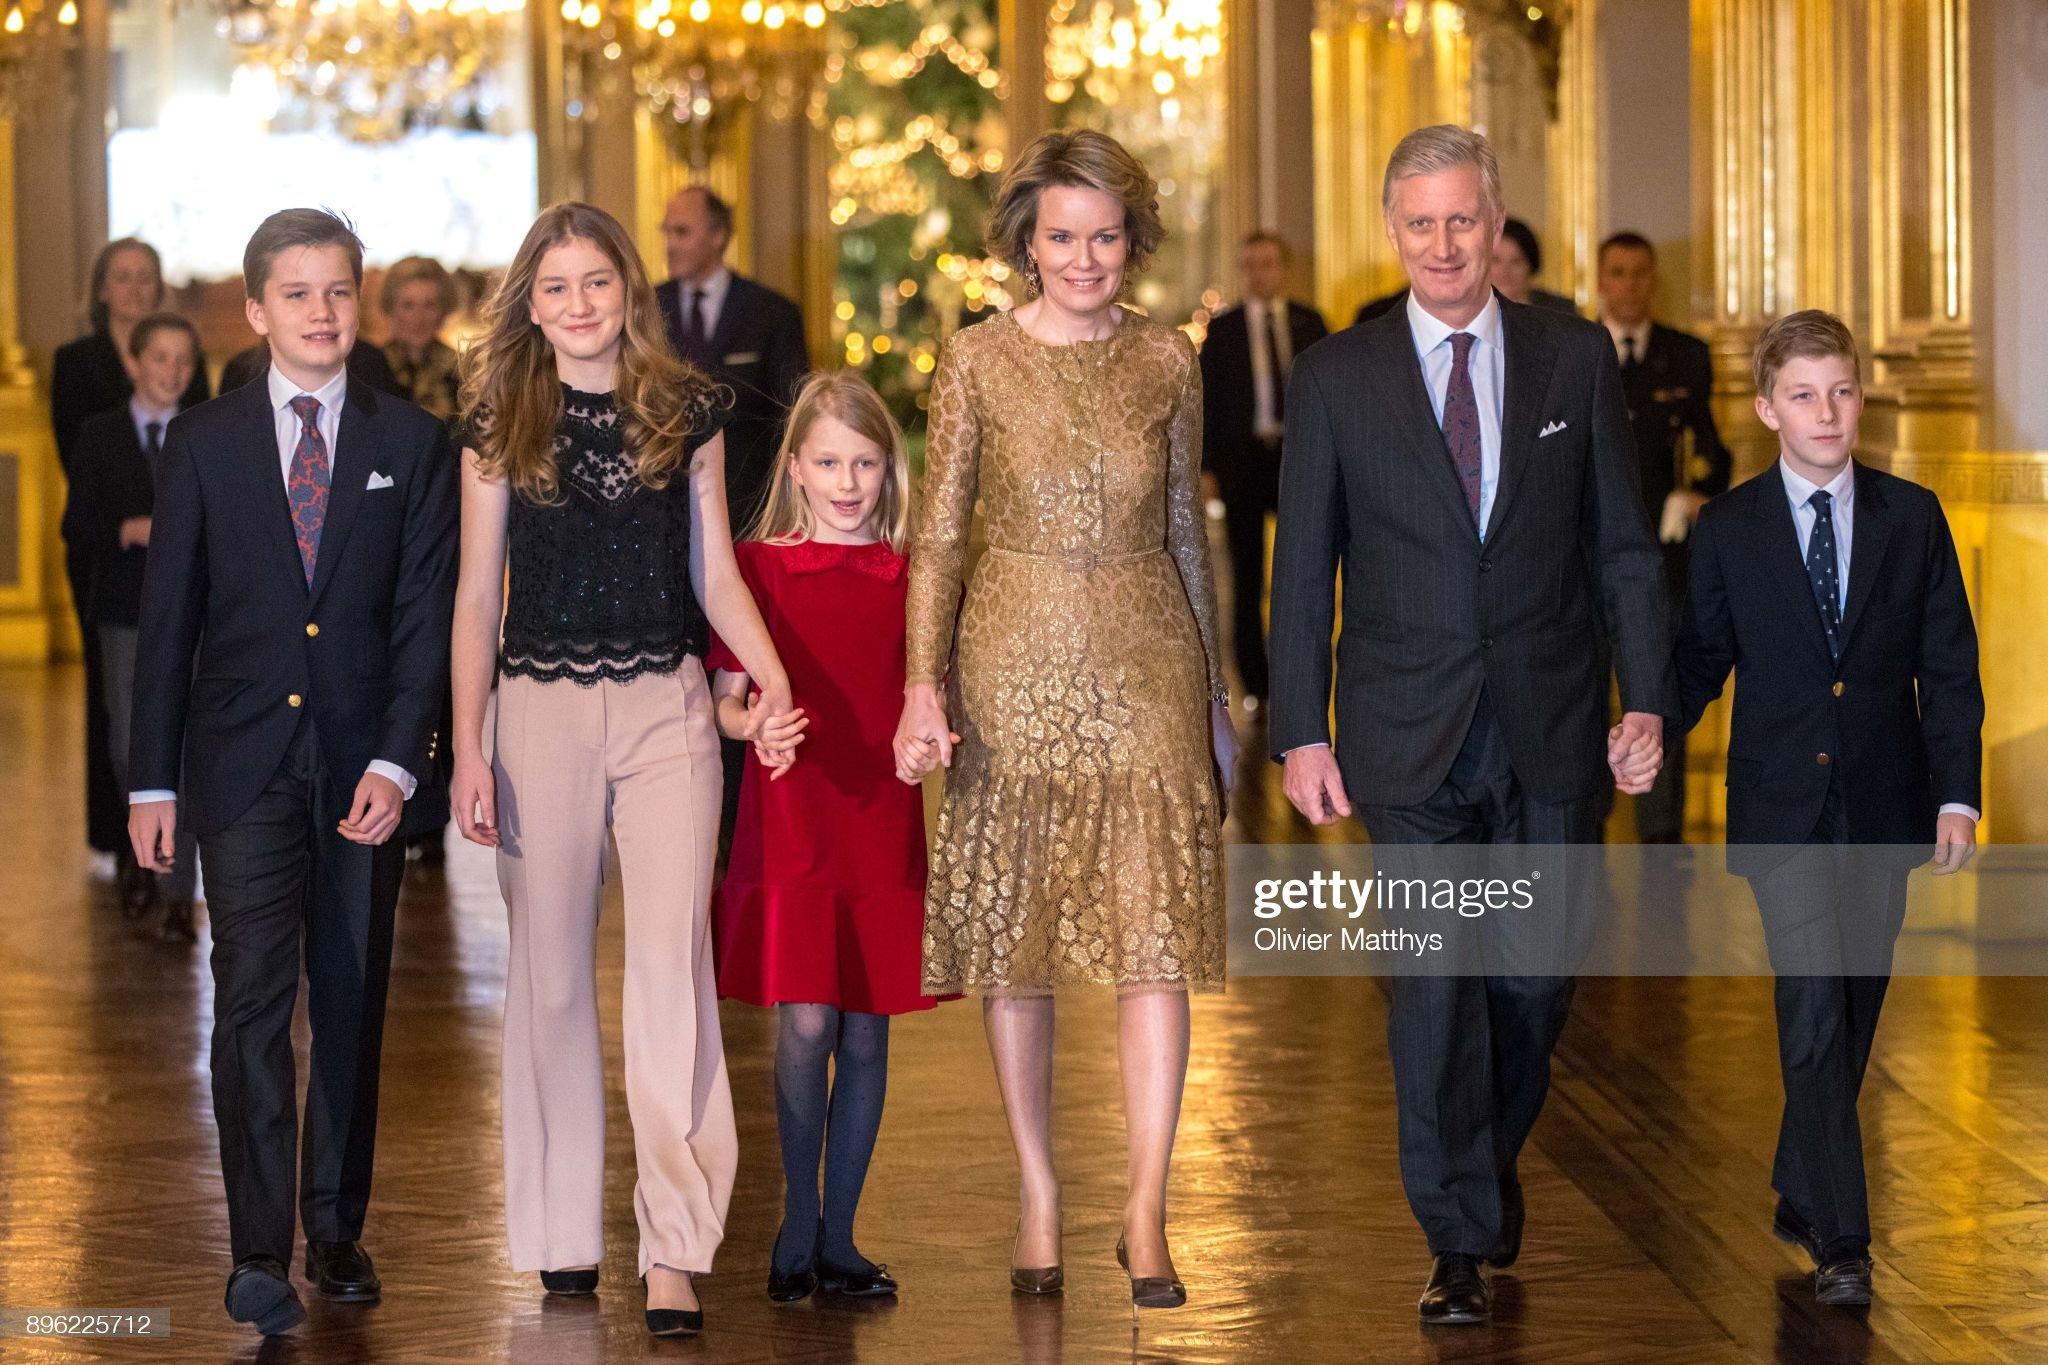 Вечерние наряды Королевы Матильды Belgian Royal Family Attends Christmas Concert At Royal Palace In Brussels : News Photo